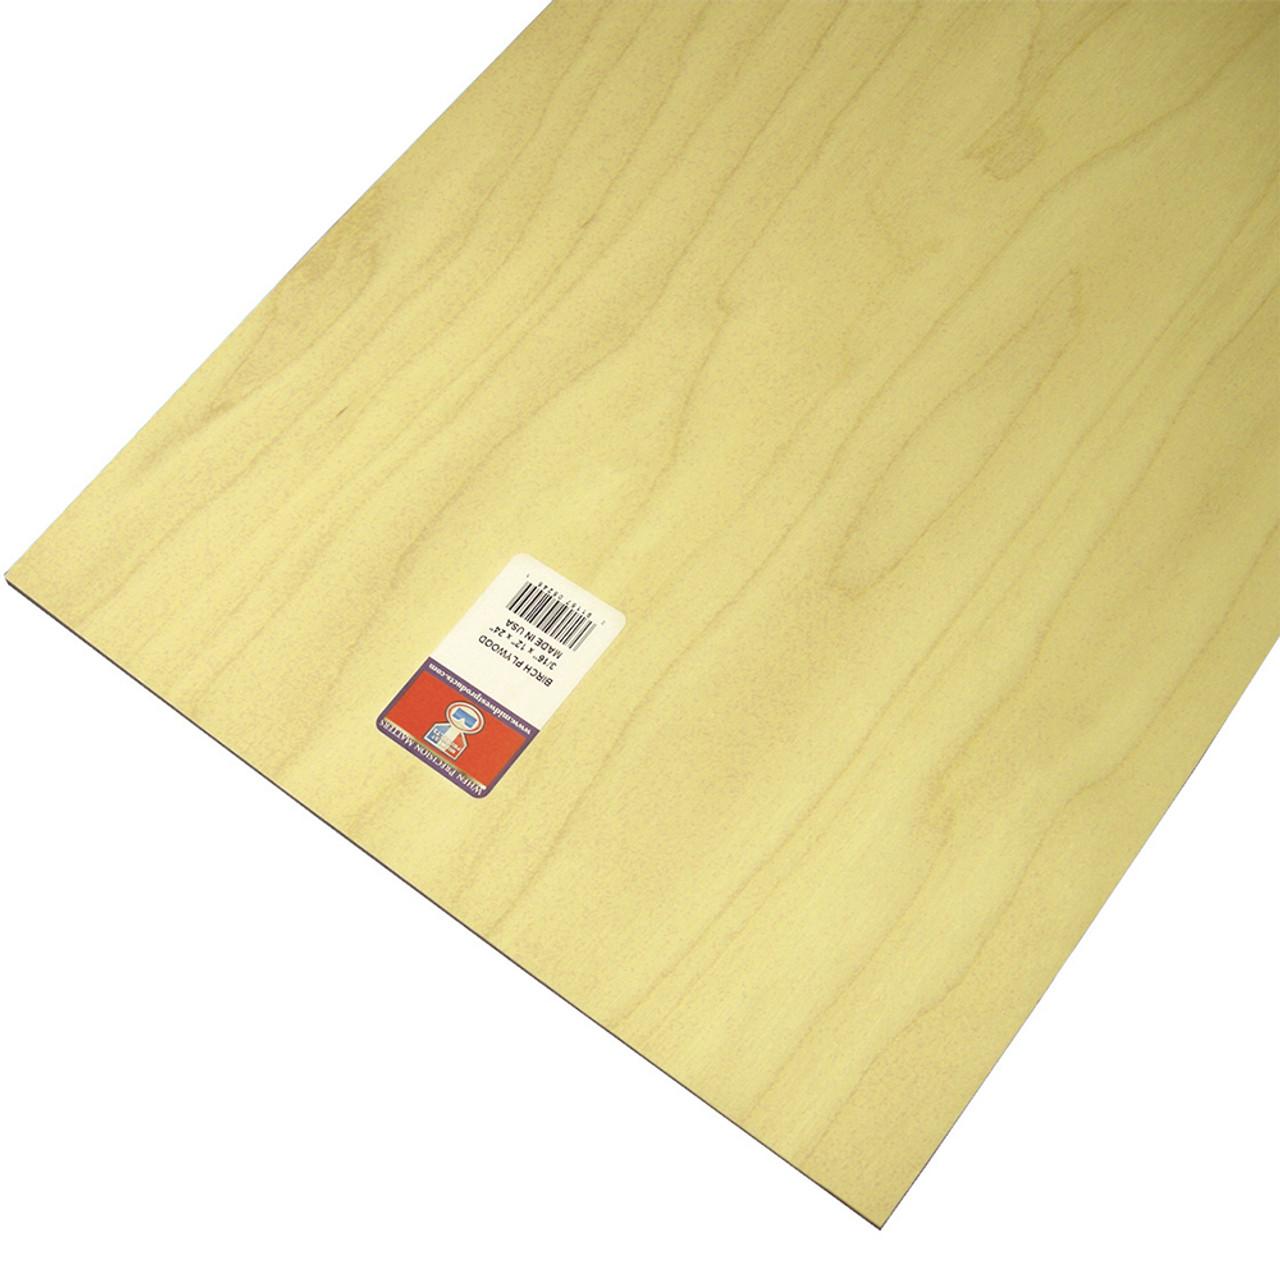 "Model Birch Thin Plywood Sheet .19"" x 12"" x 24"""